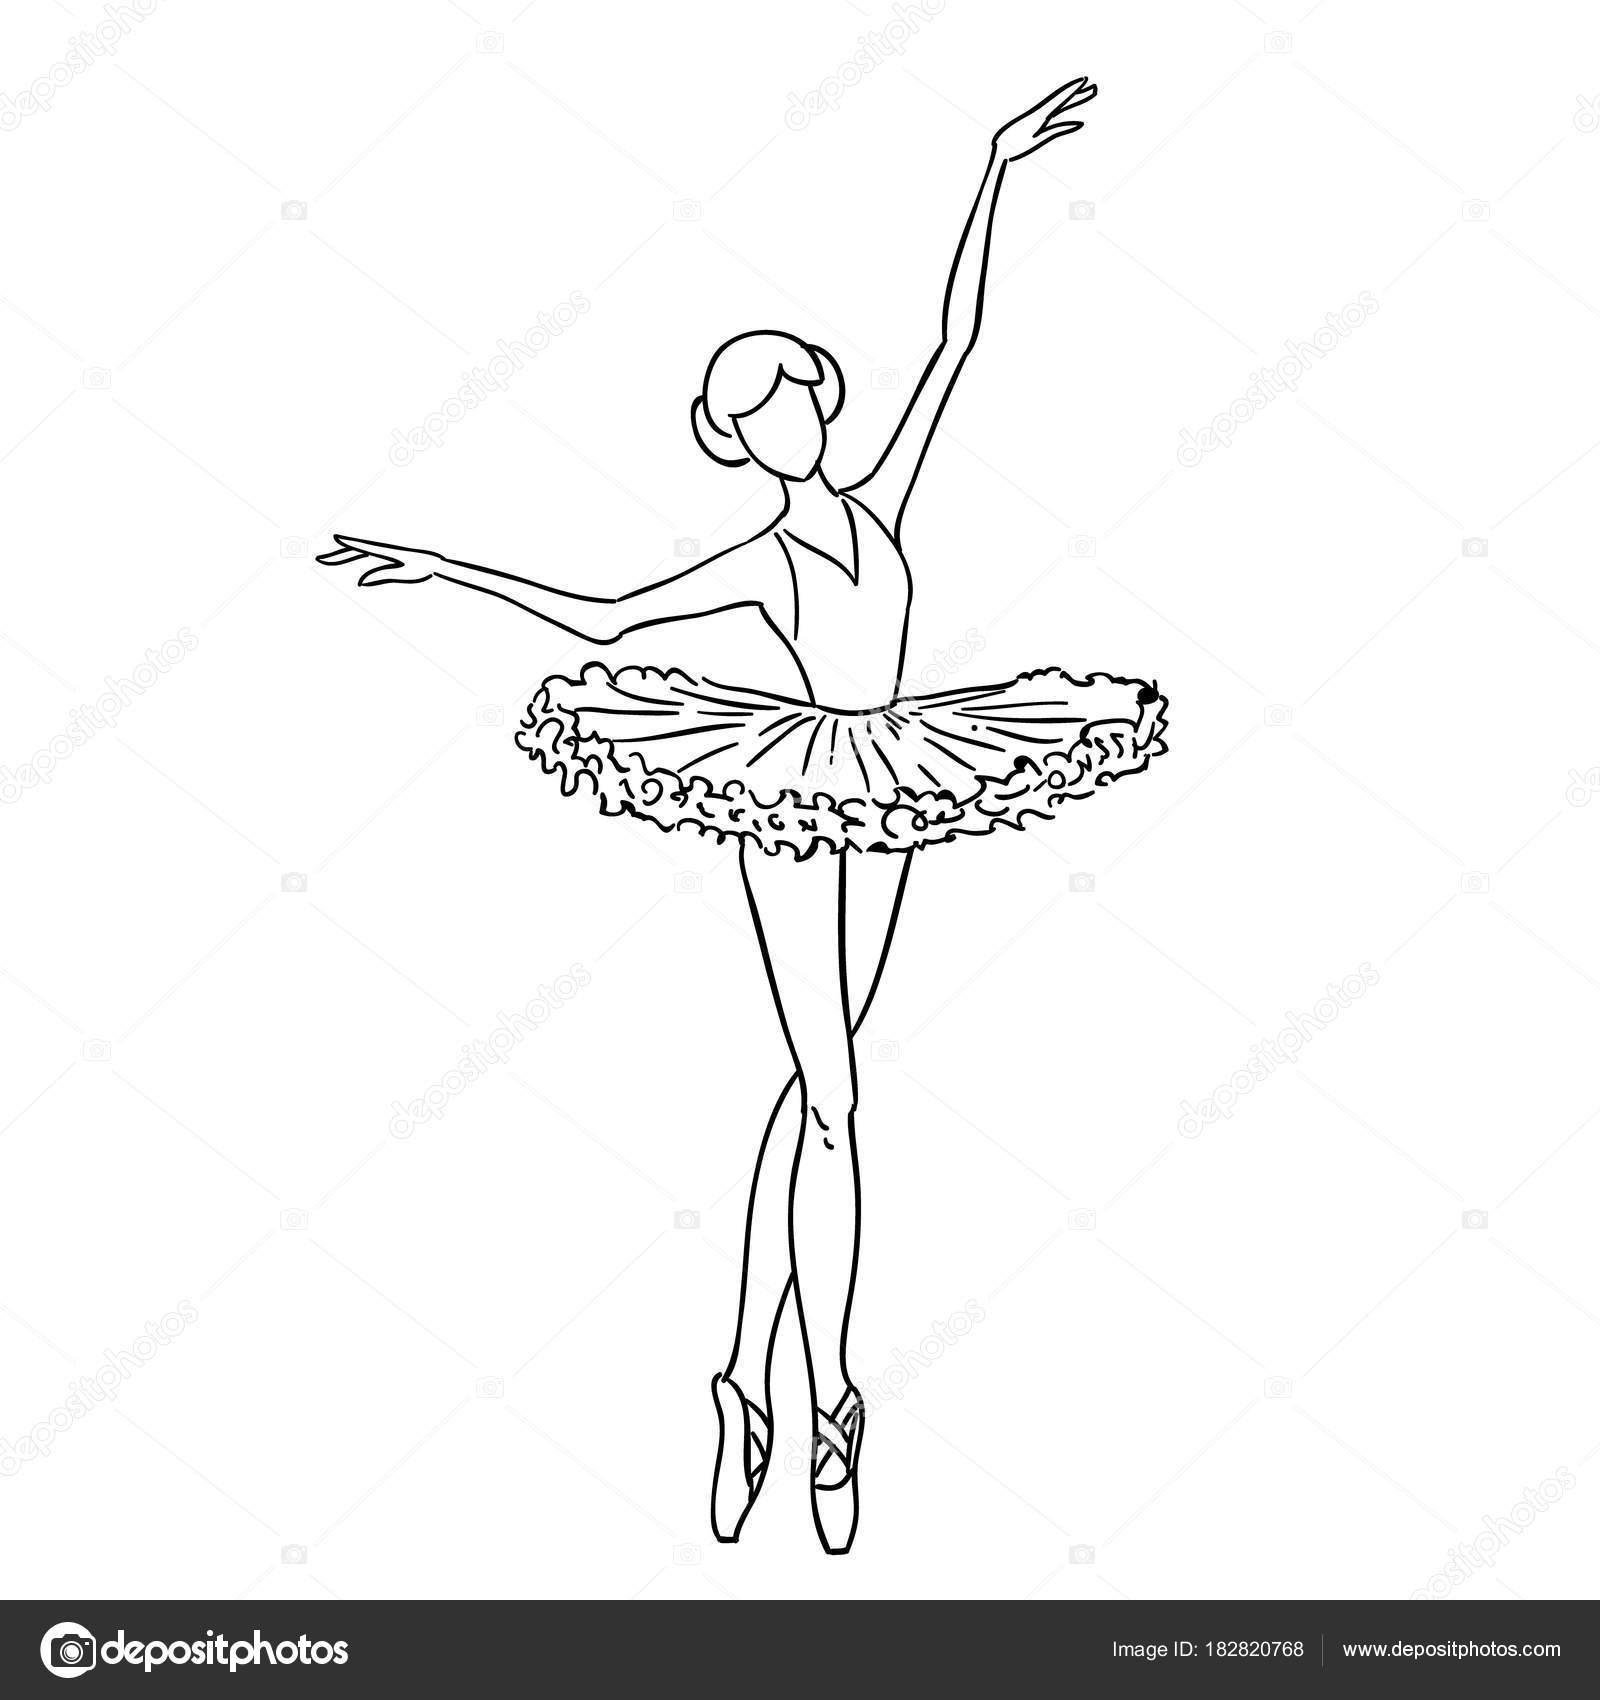 Illustration Of A Sketch Contour Drawing Of A Girl Ballerina Dancer Black And White Sketch Cartoon Doodle Stock Vector C Volodmar 182820768